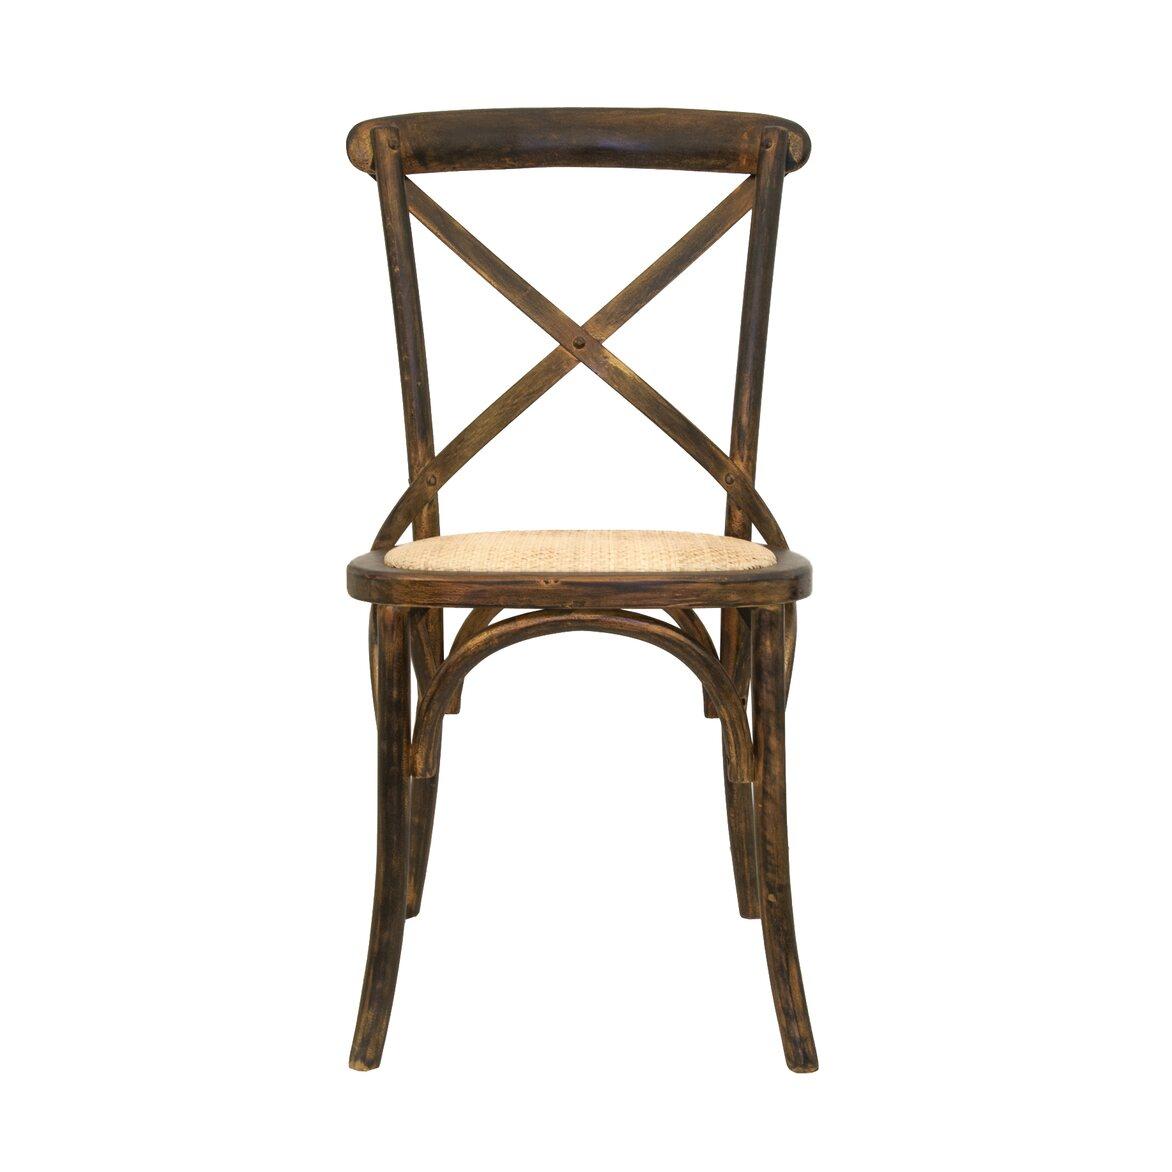 Стул Cross back bronze | Обеденные стулья Kingsby